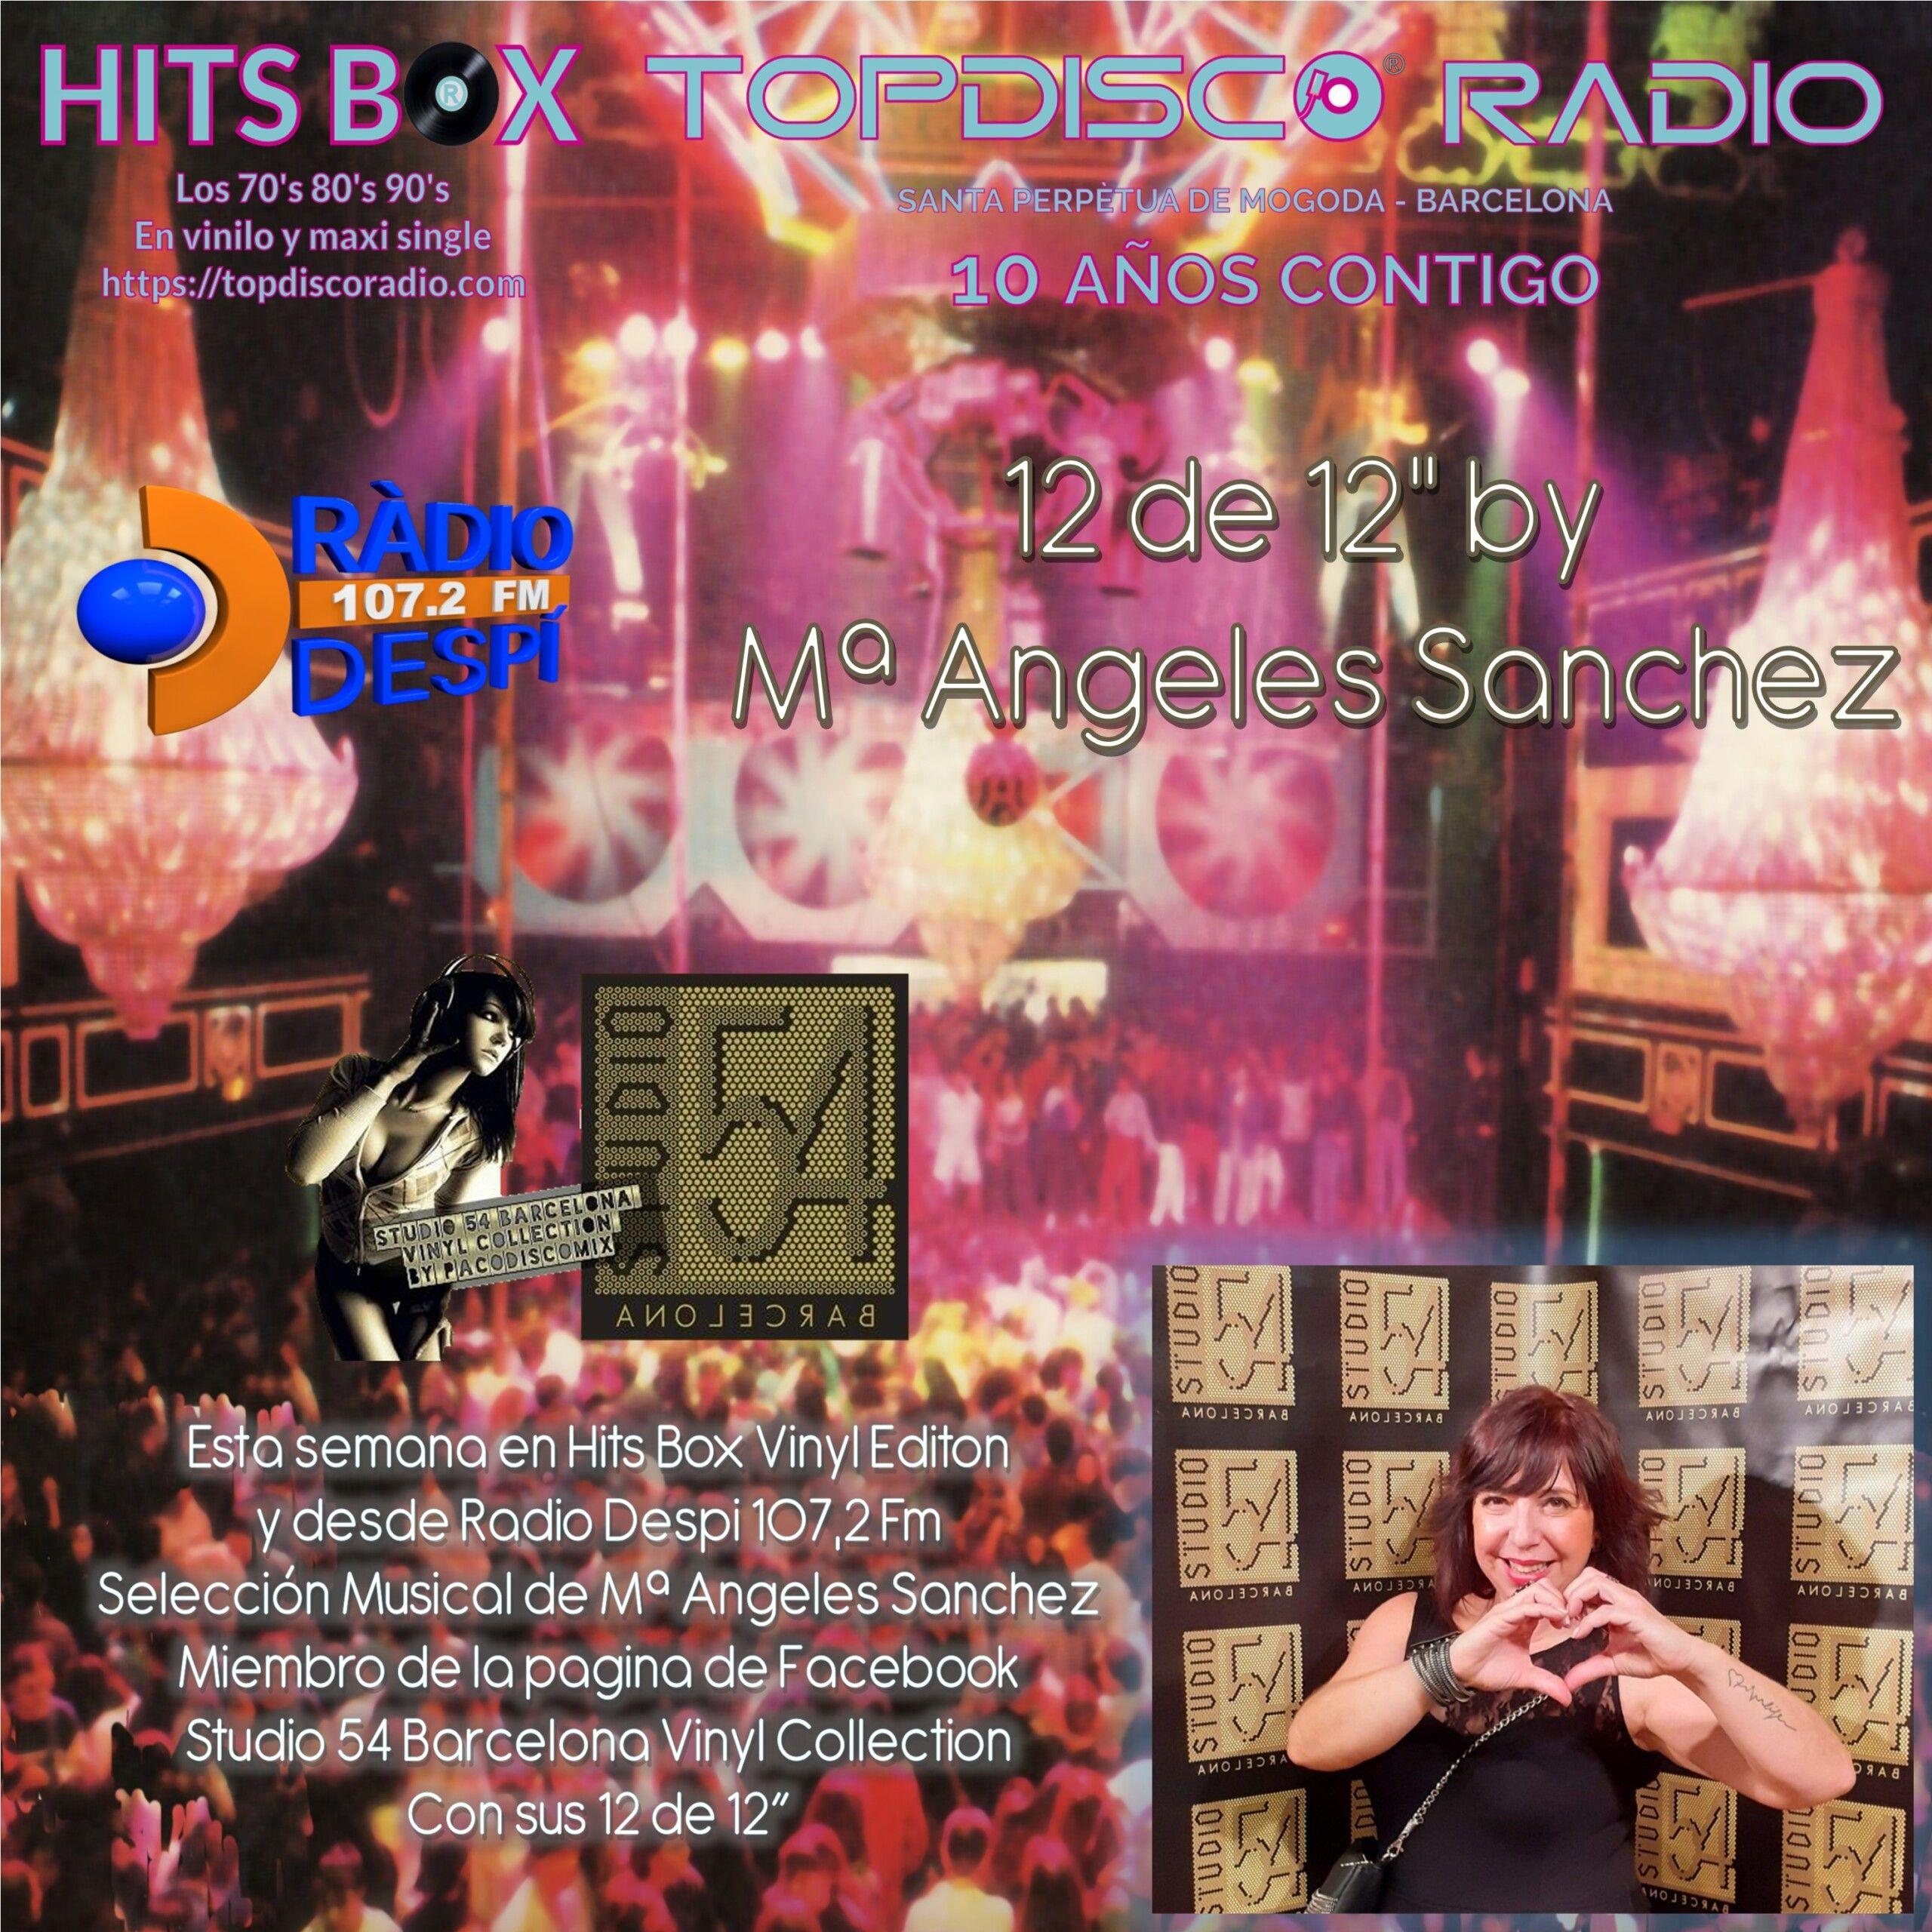 12 de 12 M.Angeles Sanchez - Topdisco Radio - Hits Box - Radio Despi